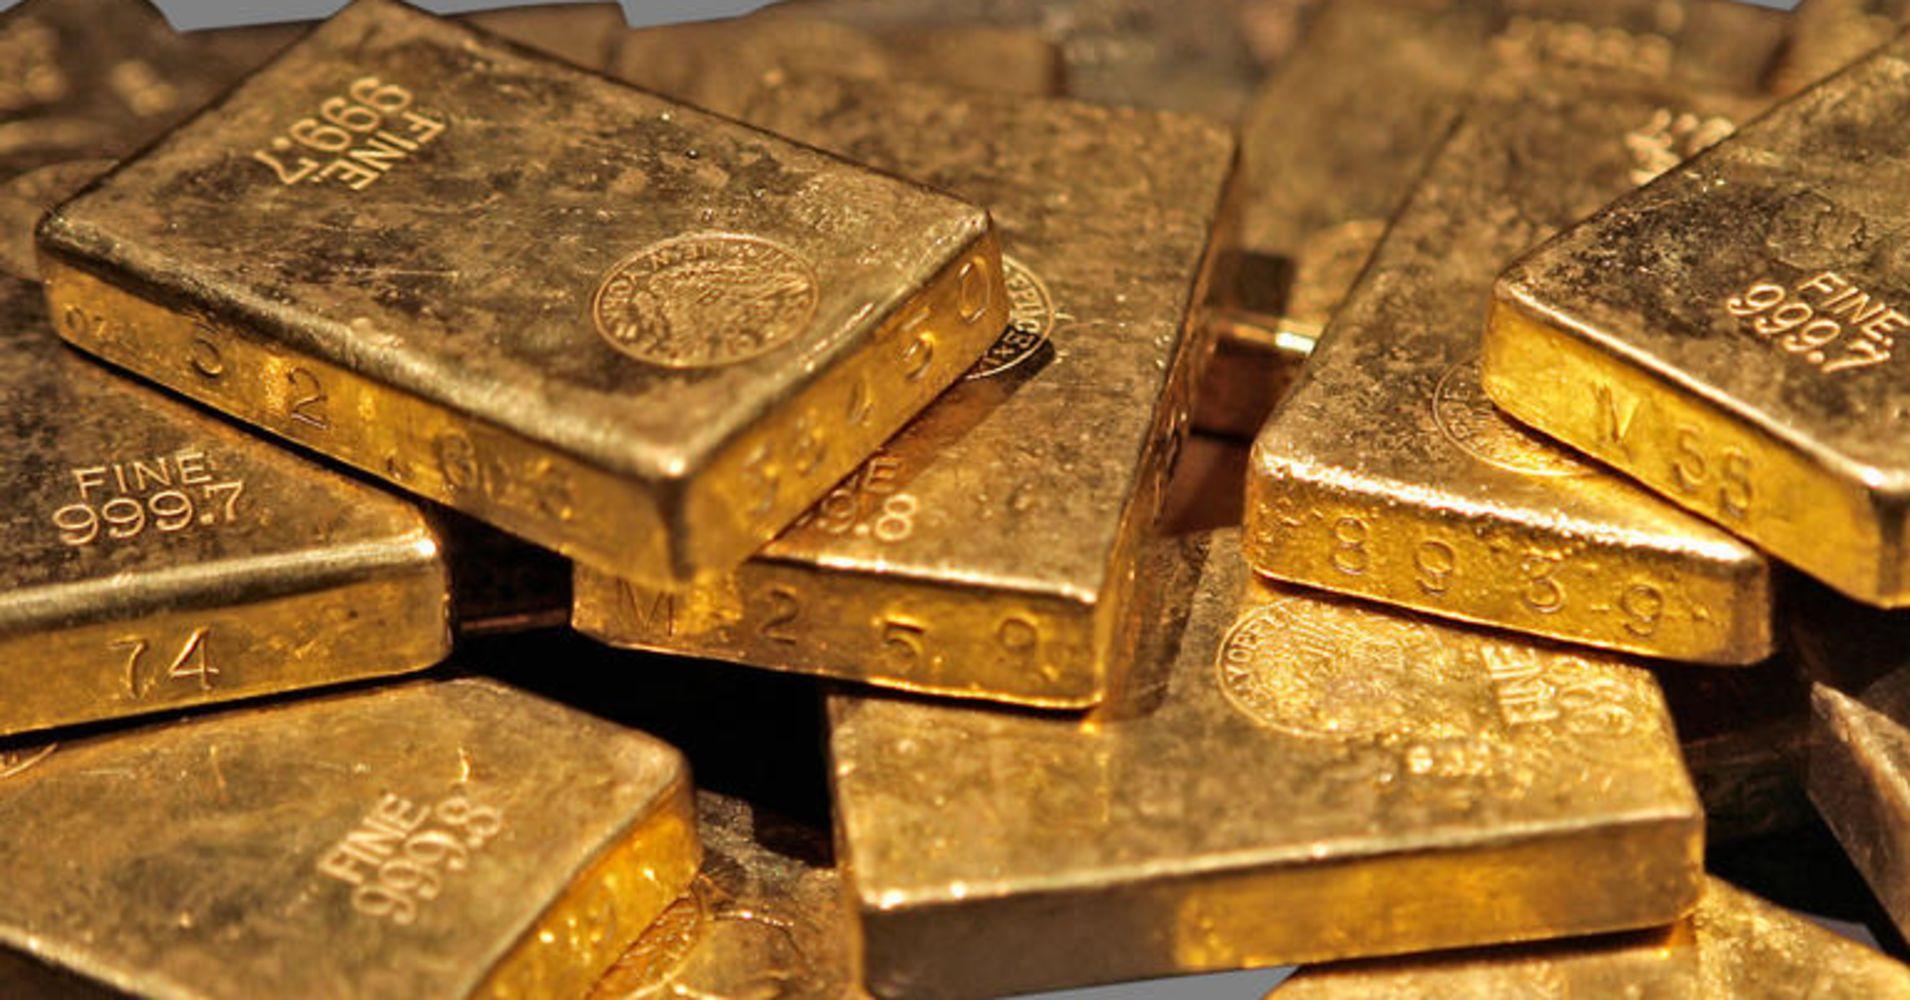 33594912-gold_bars.1910x1000.jpg